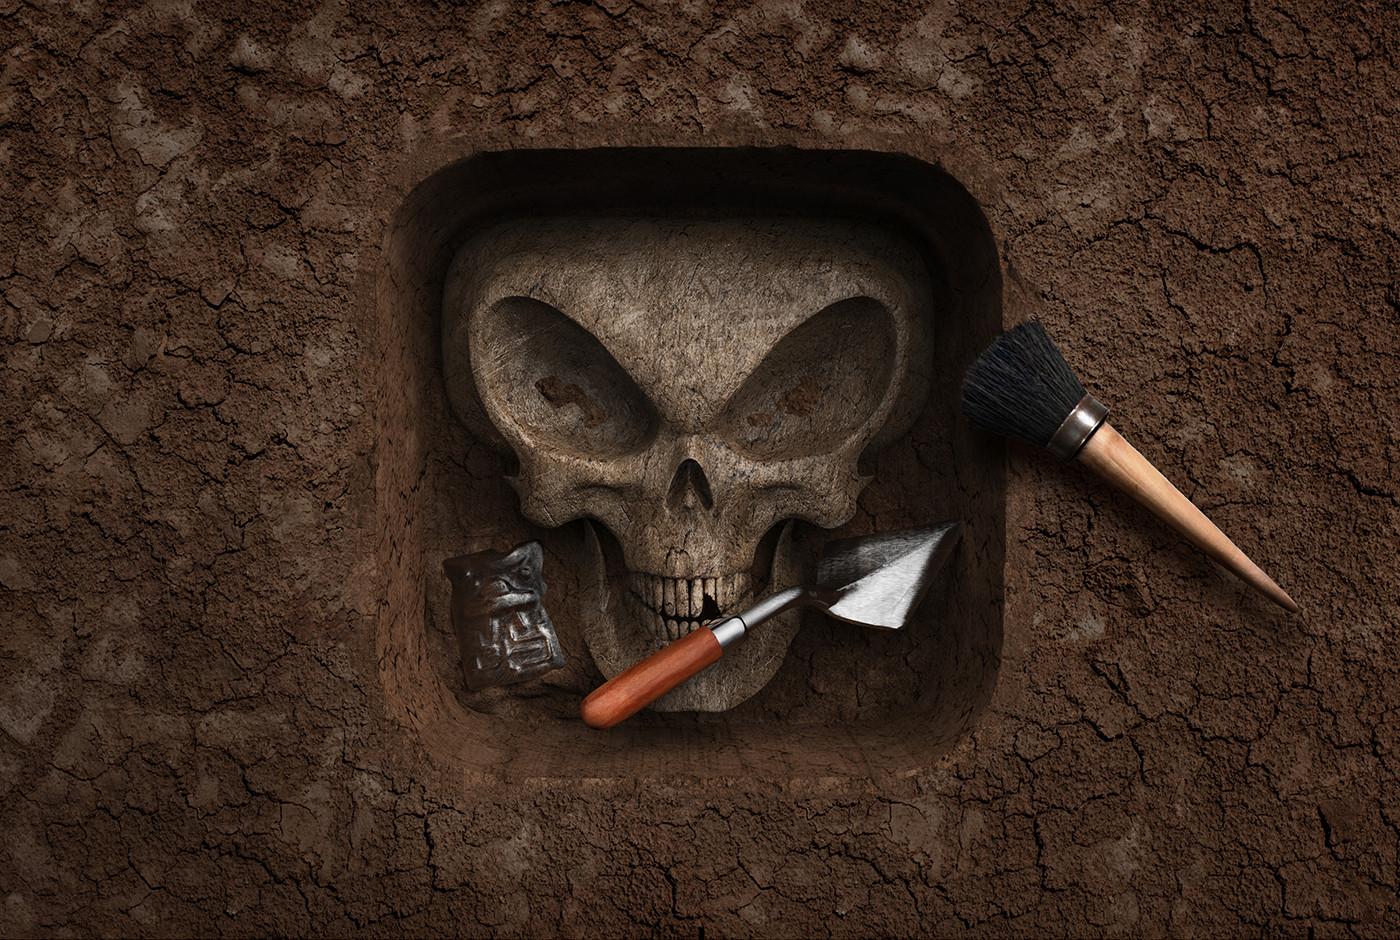 Tomislav zvonaric forbidden archeology icon scene